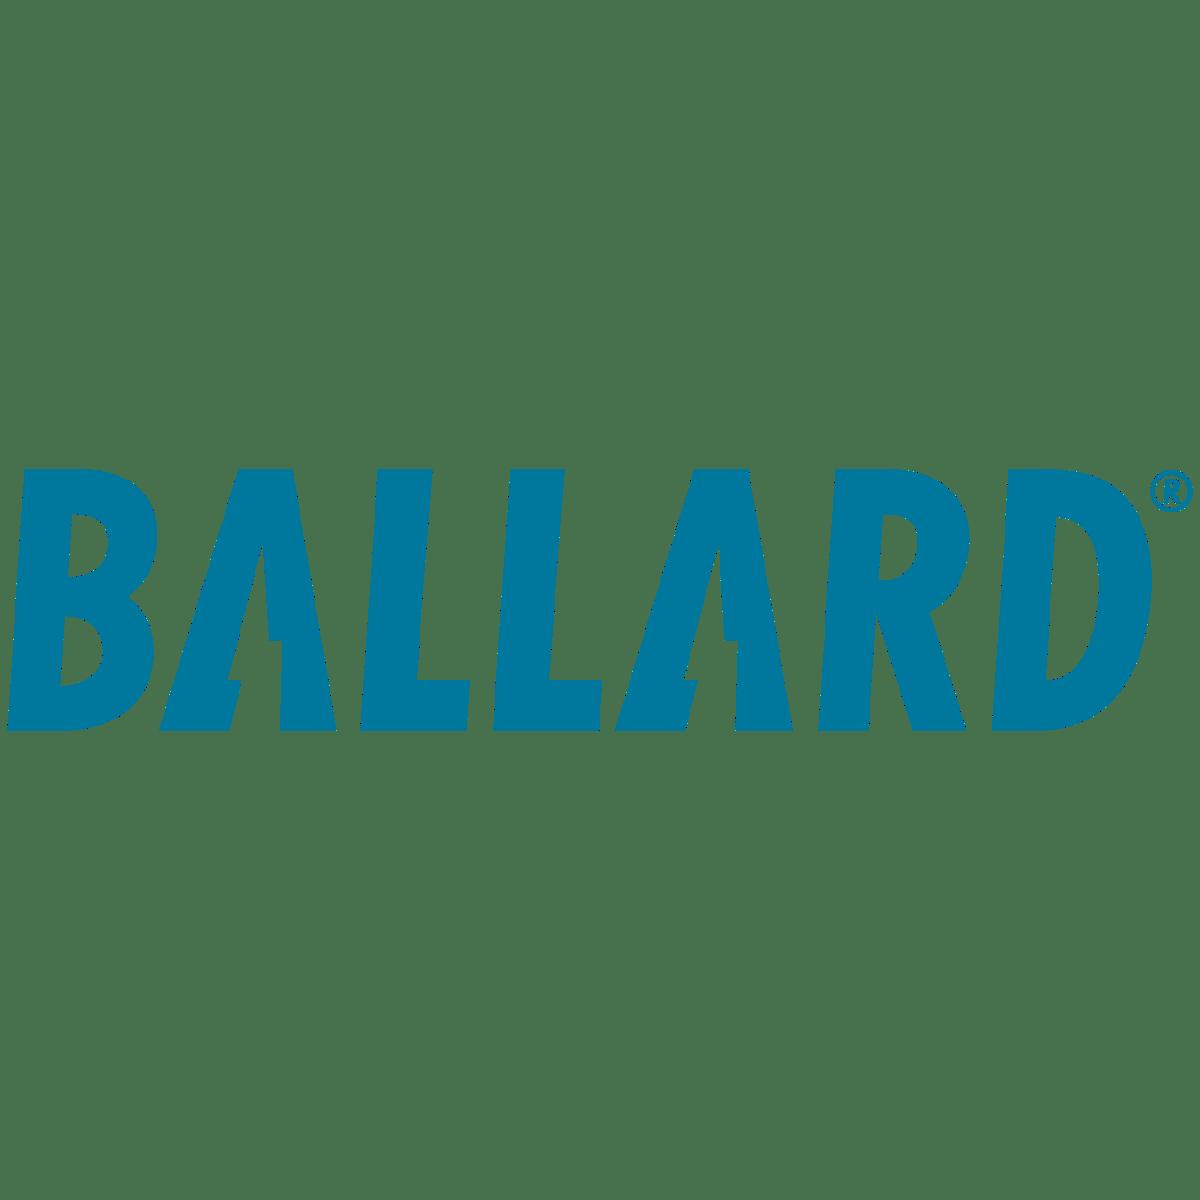 Ballard Power Systems | Fundamentale Aktienanalyse